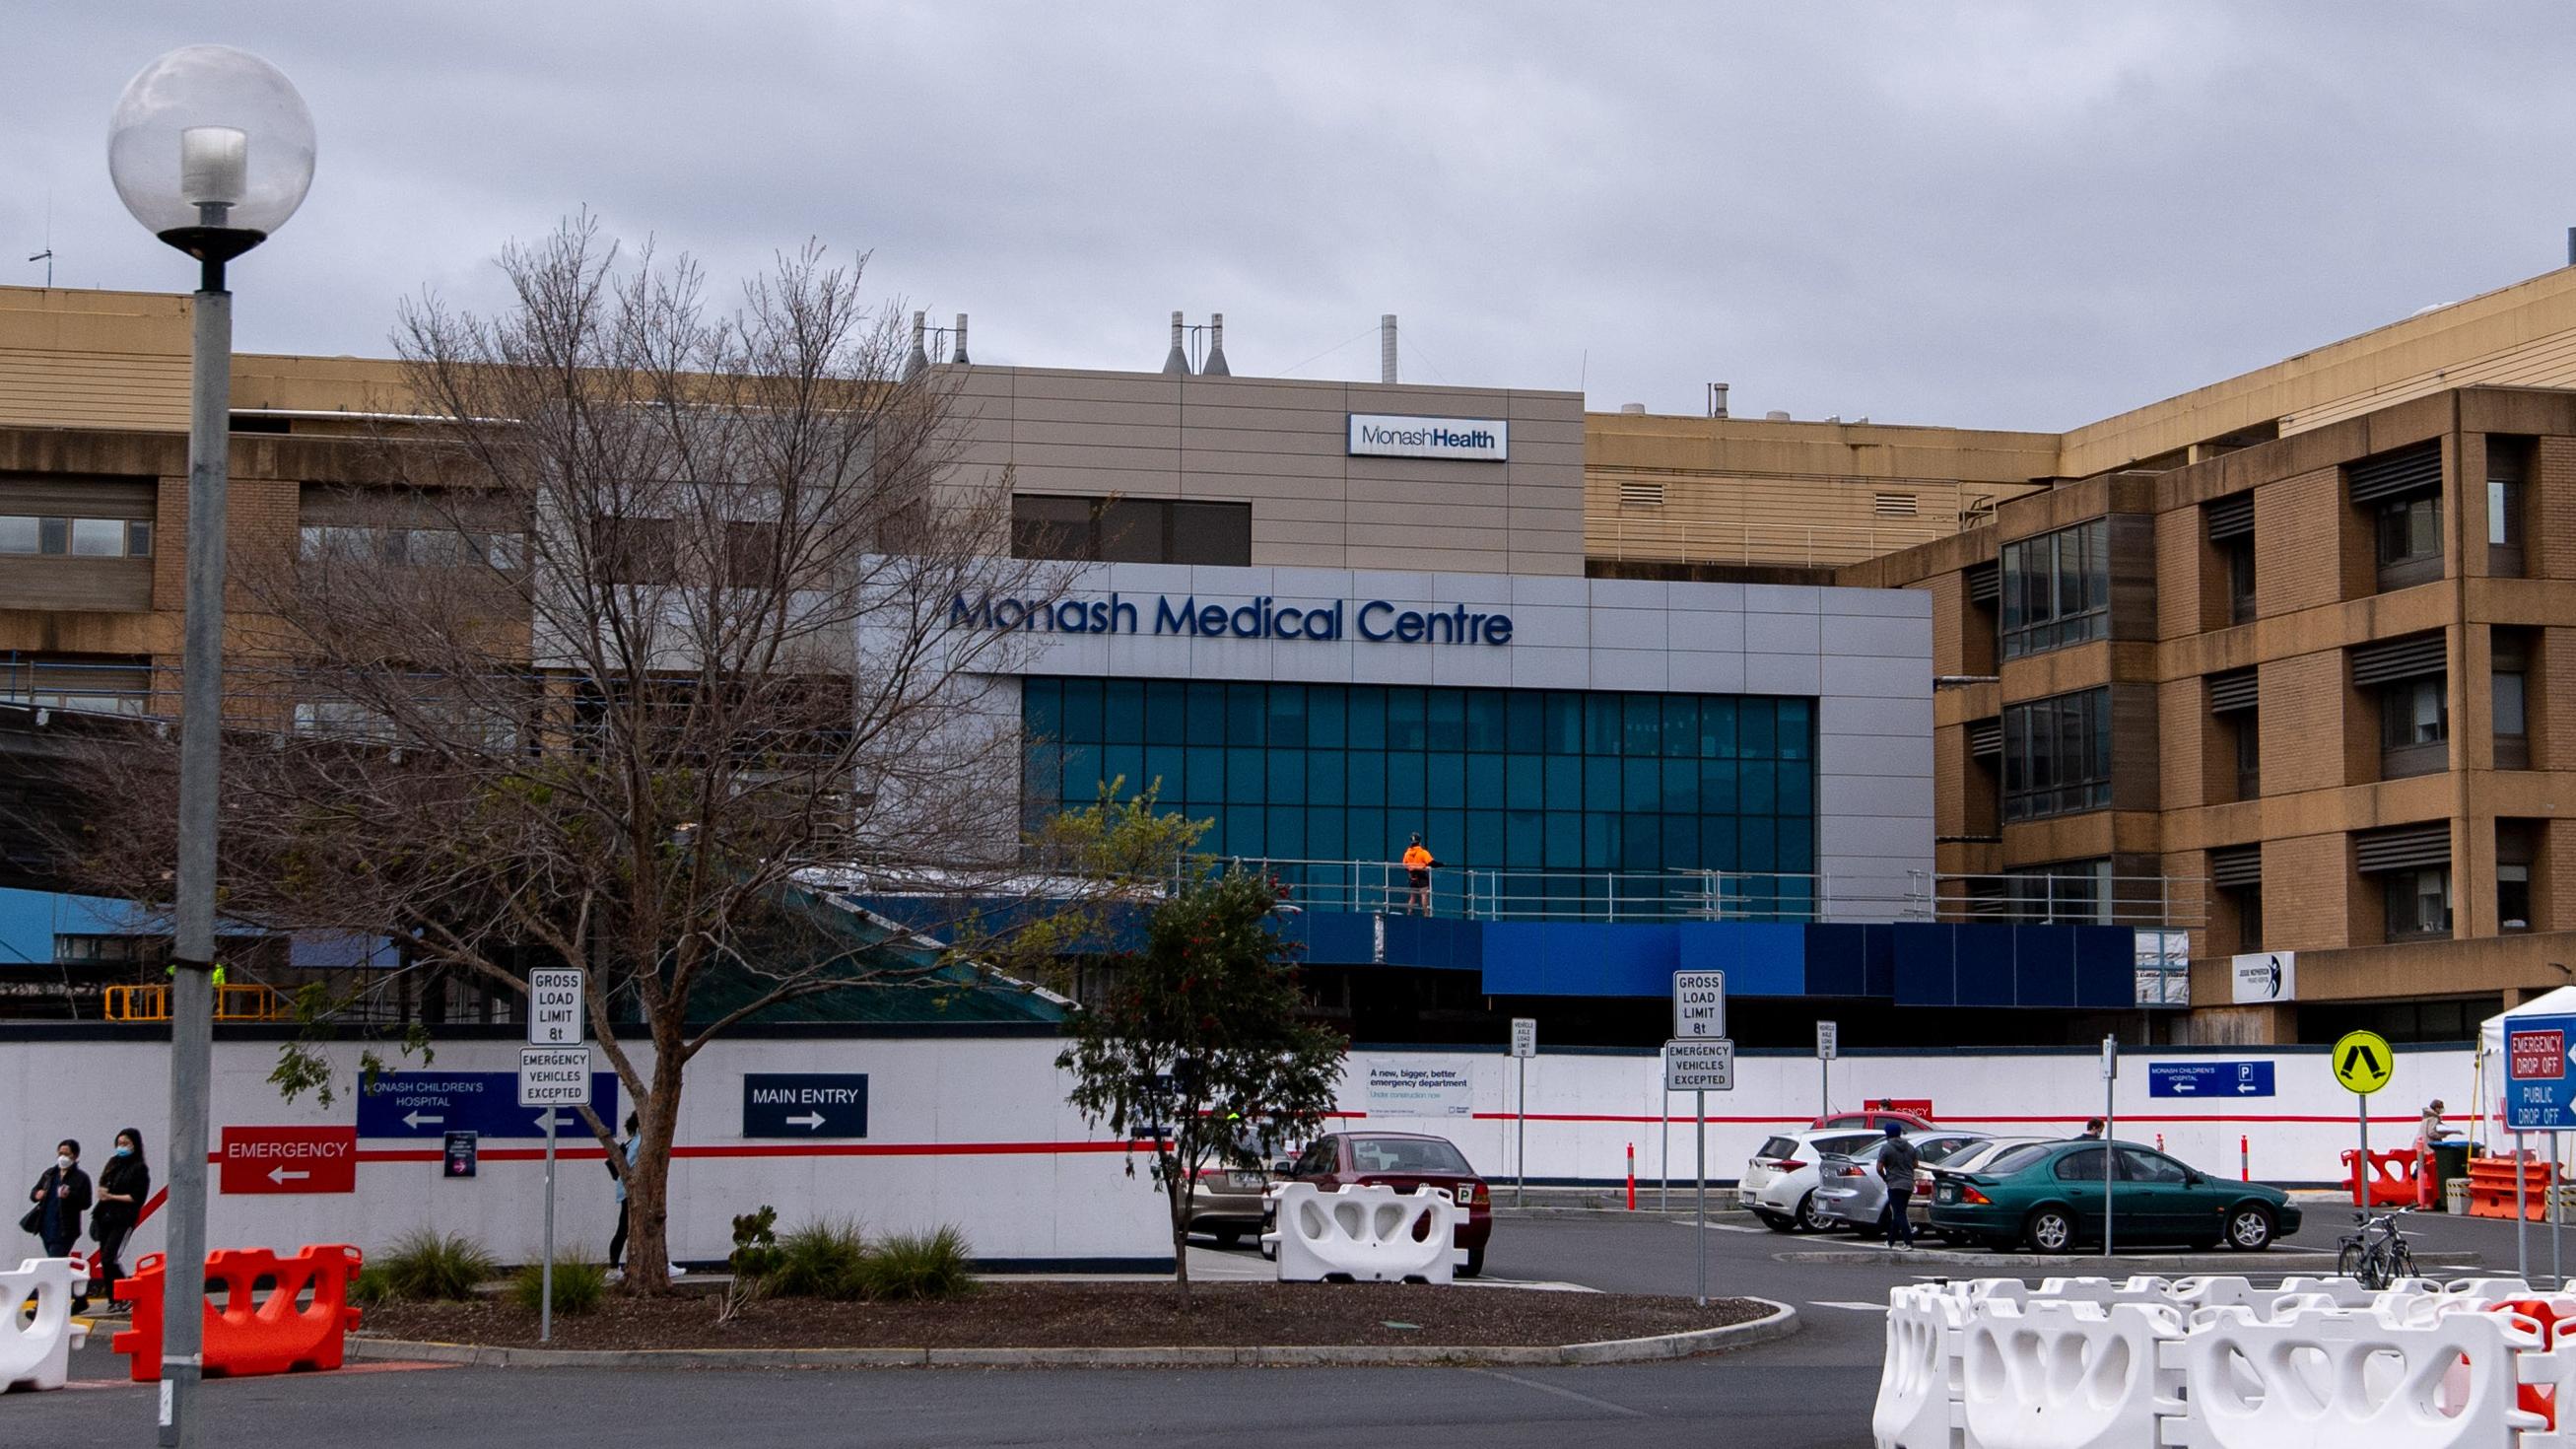 Monash Medical Centre in Melbourne.